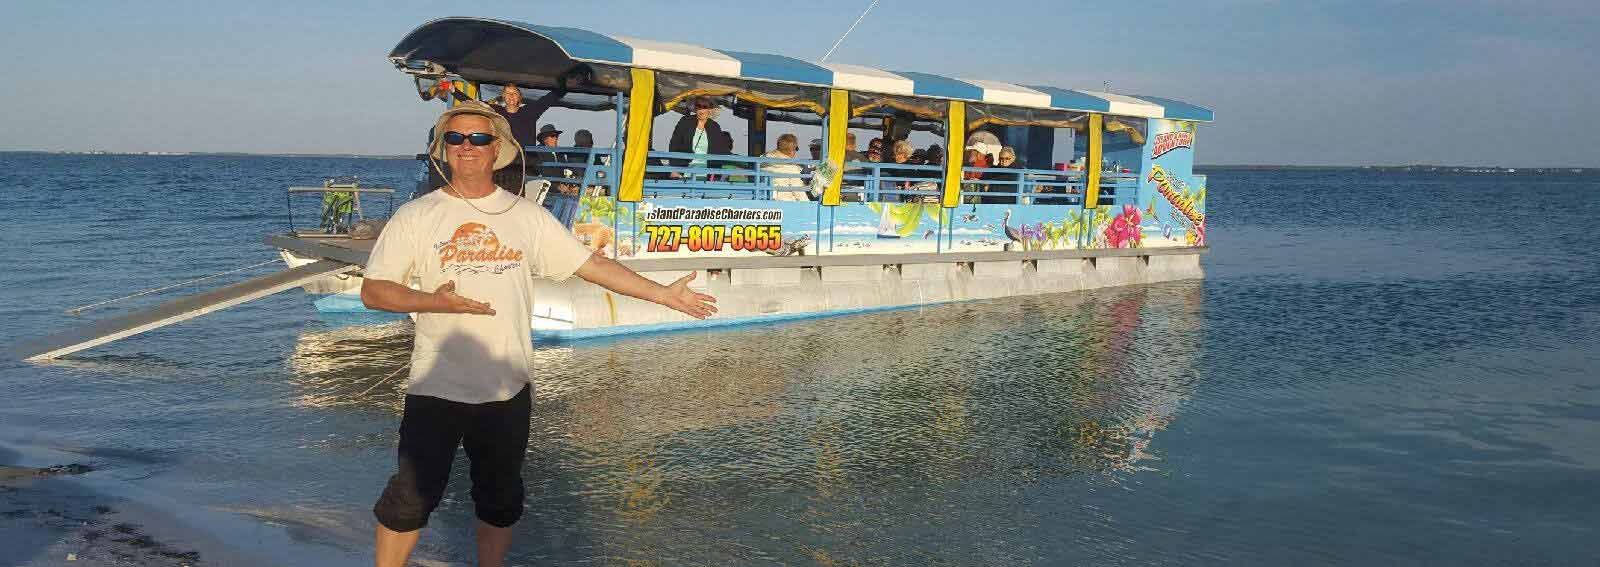 island-paradise-charter-adrenaline-fishing-new-port-richey-florida-captain-bob